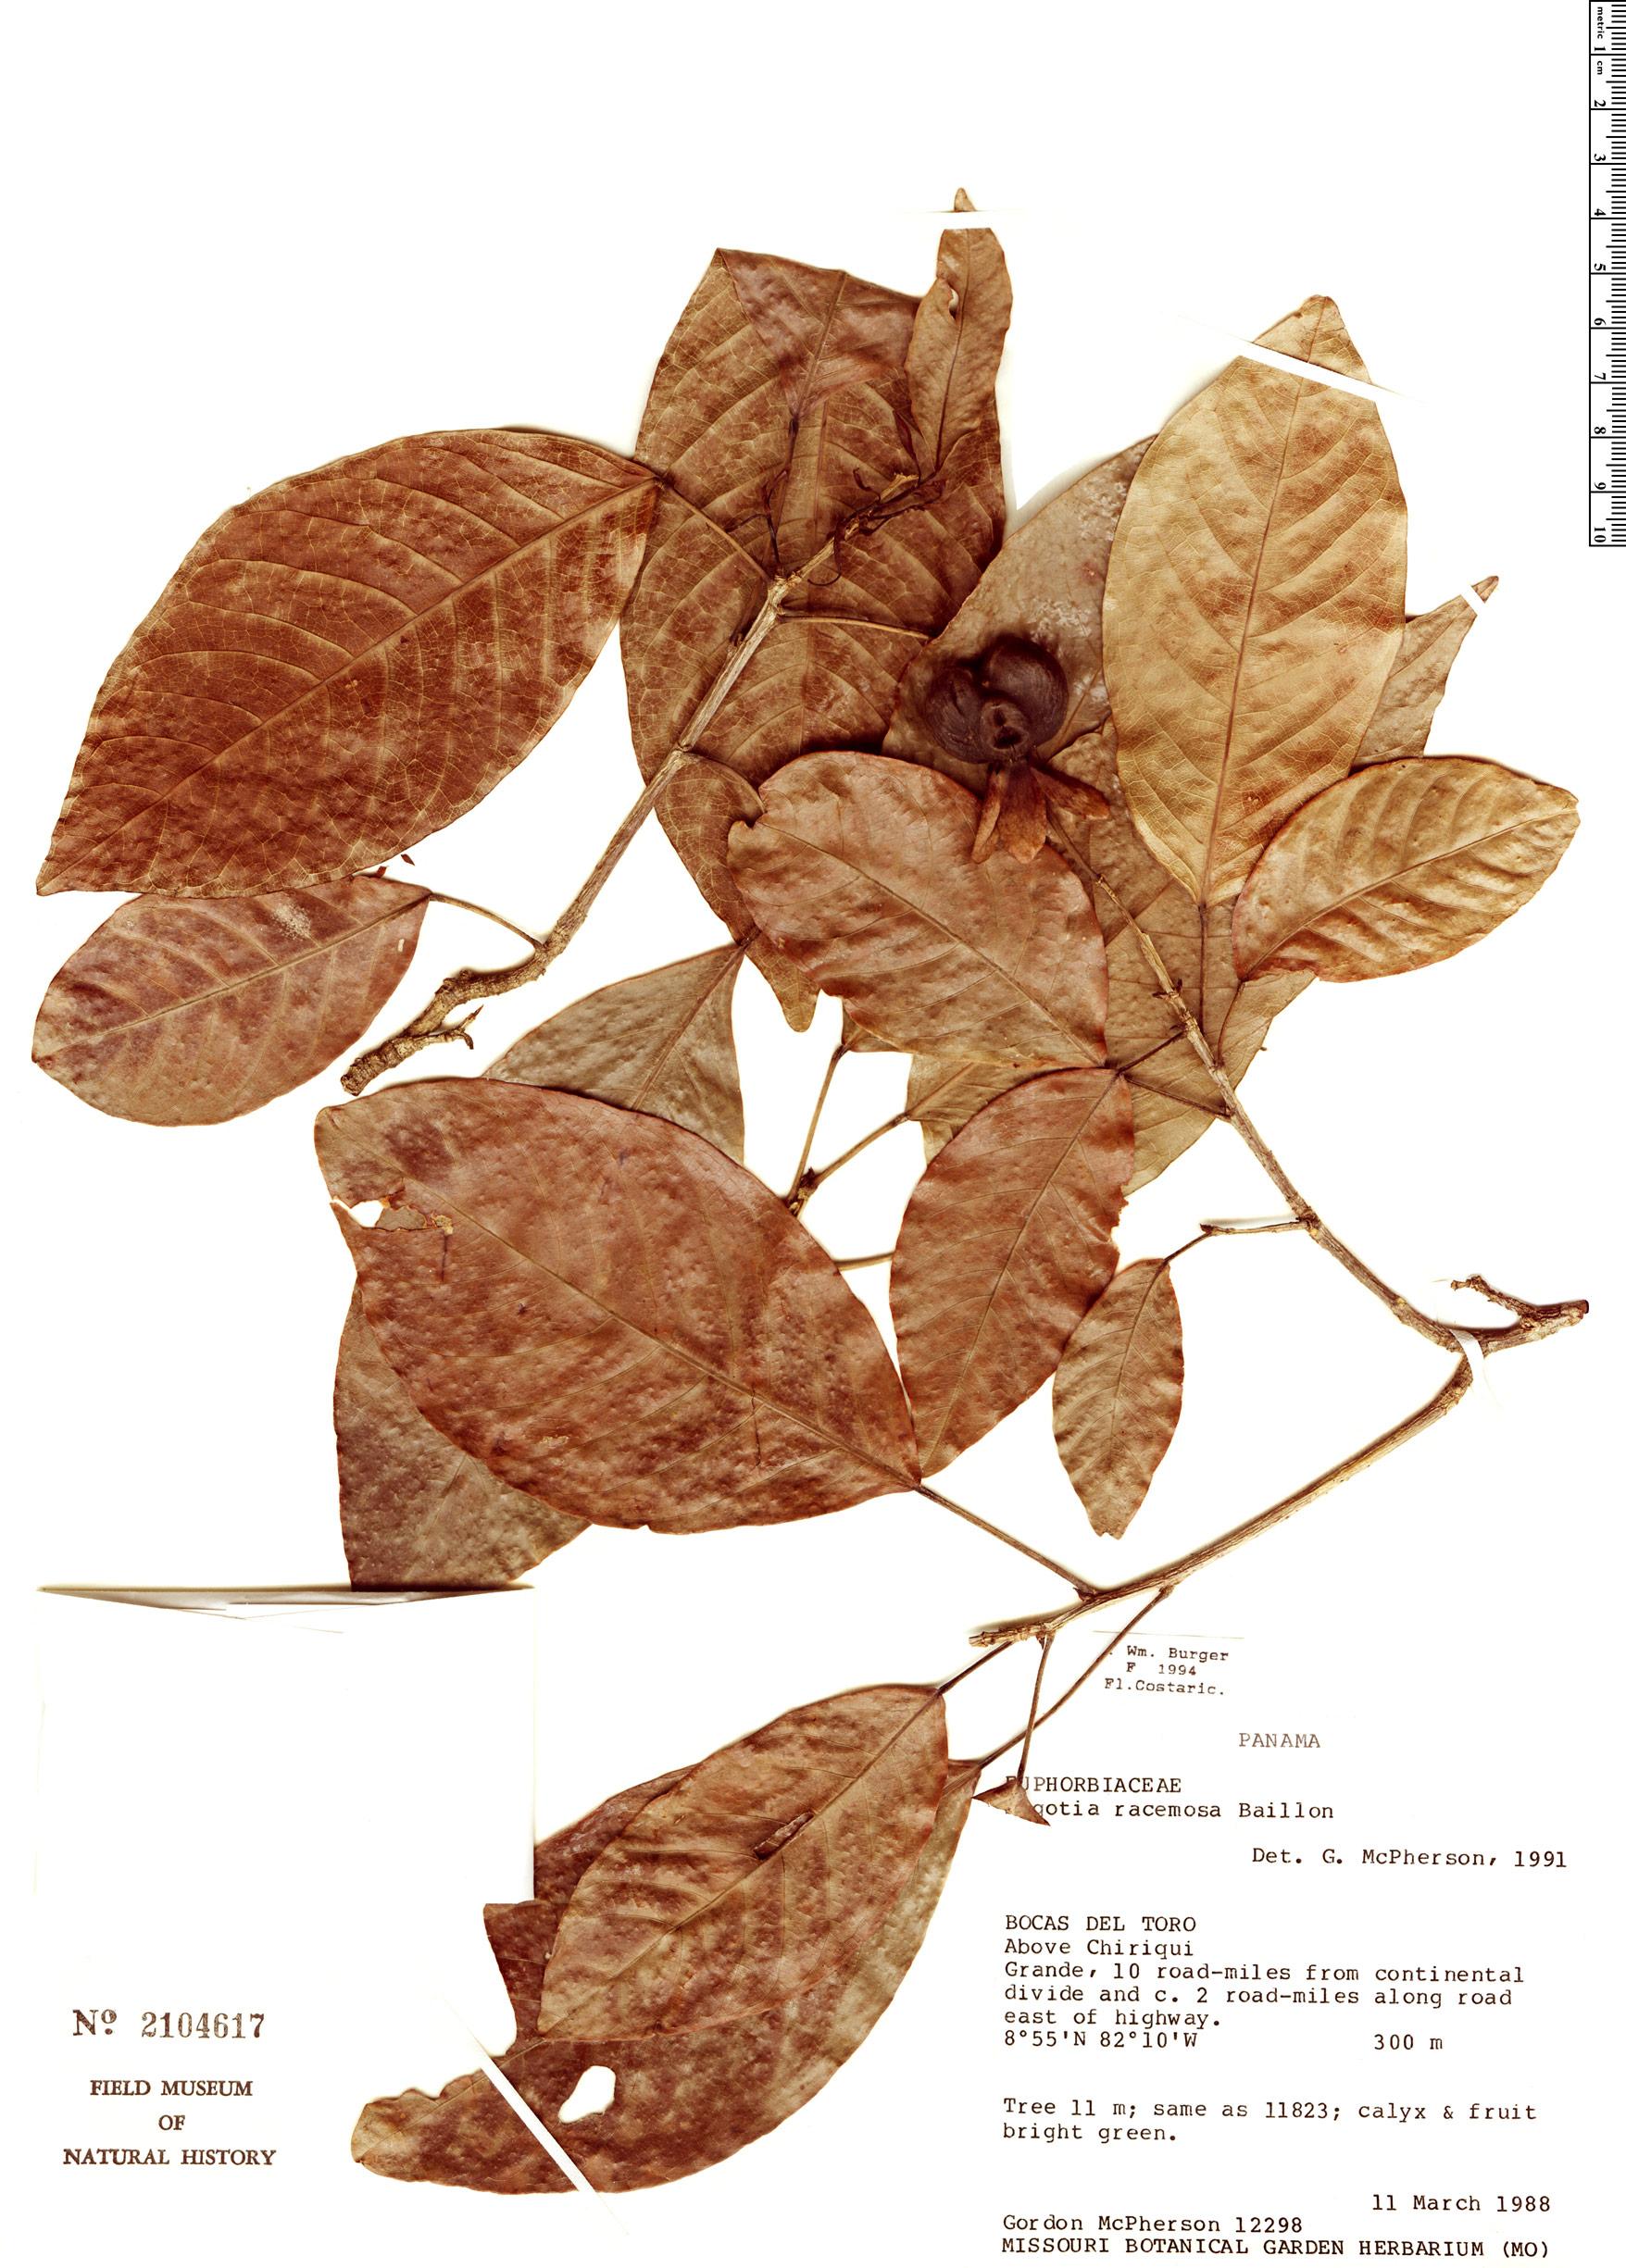 Specimen: Sagotia racemosa